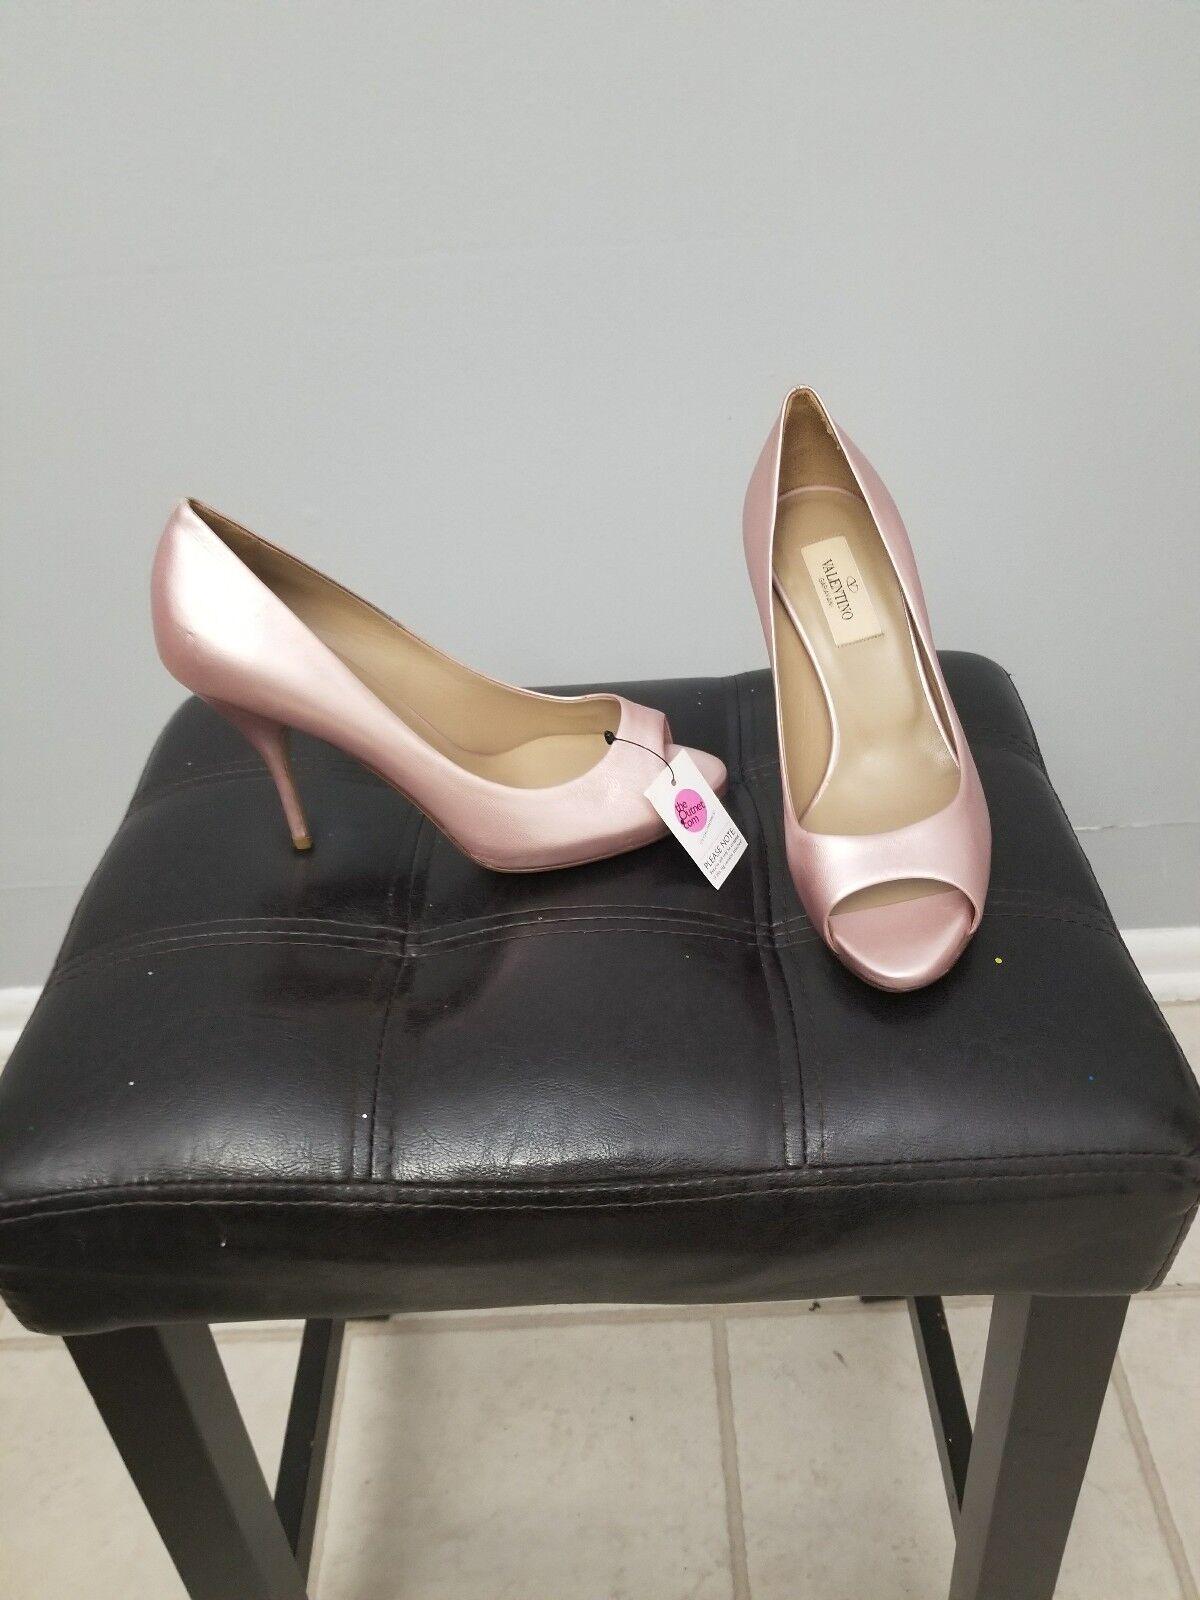 Valentino Women's Pink - Leather, EU 37 US 7 Brand Brand Brand New No Box b7bc2f